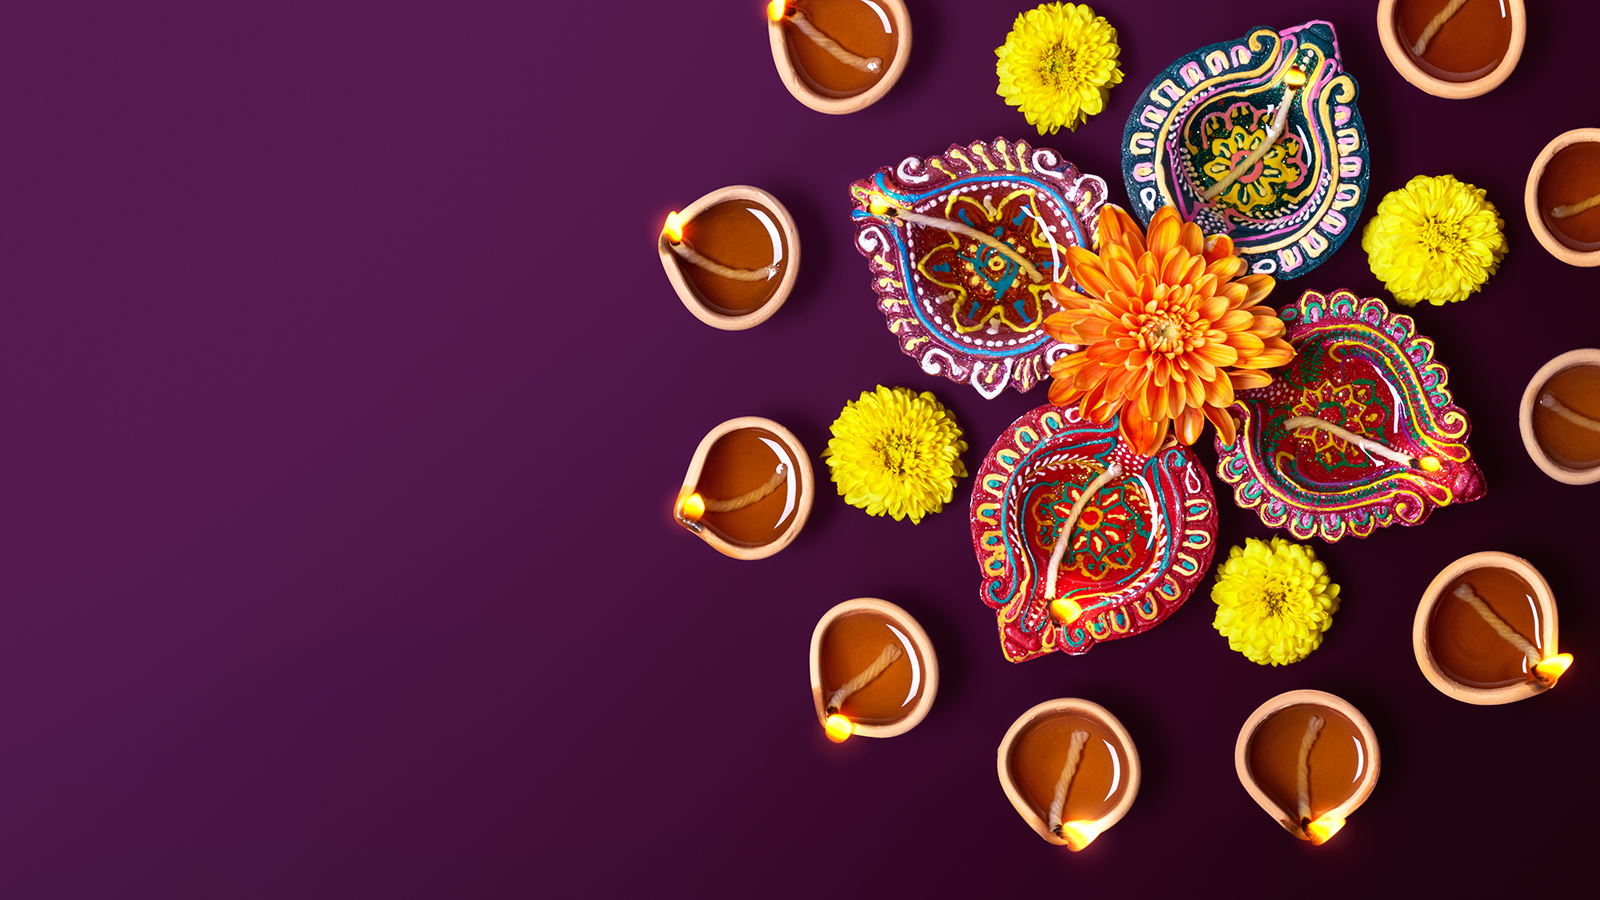 Deepavali Festival Images